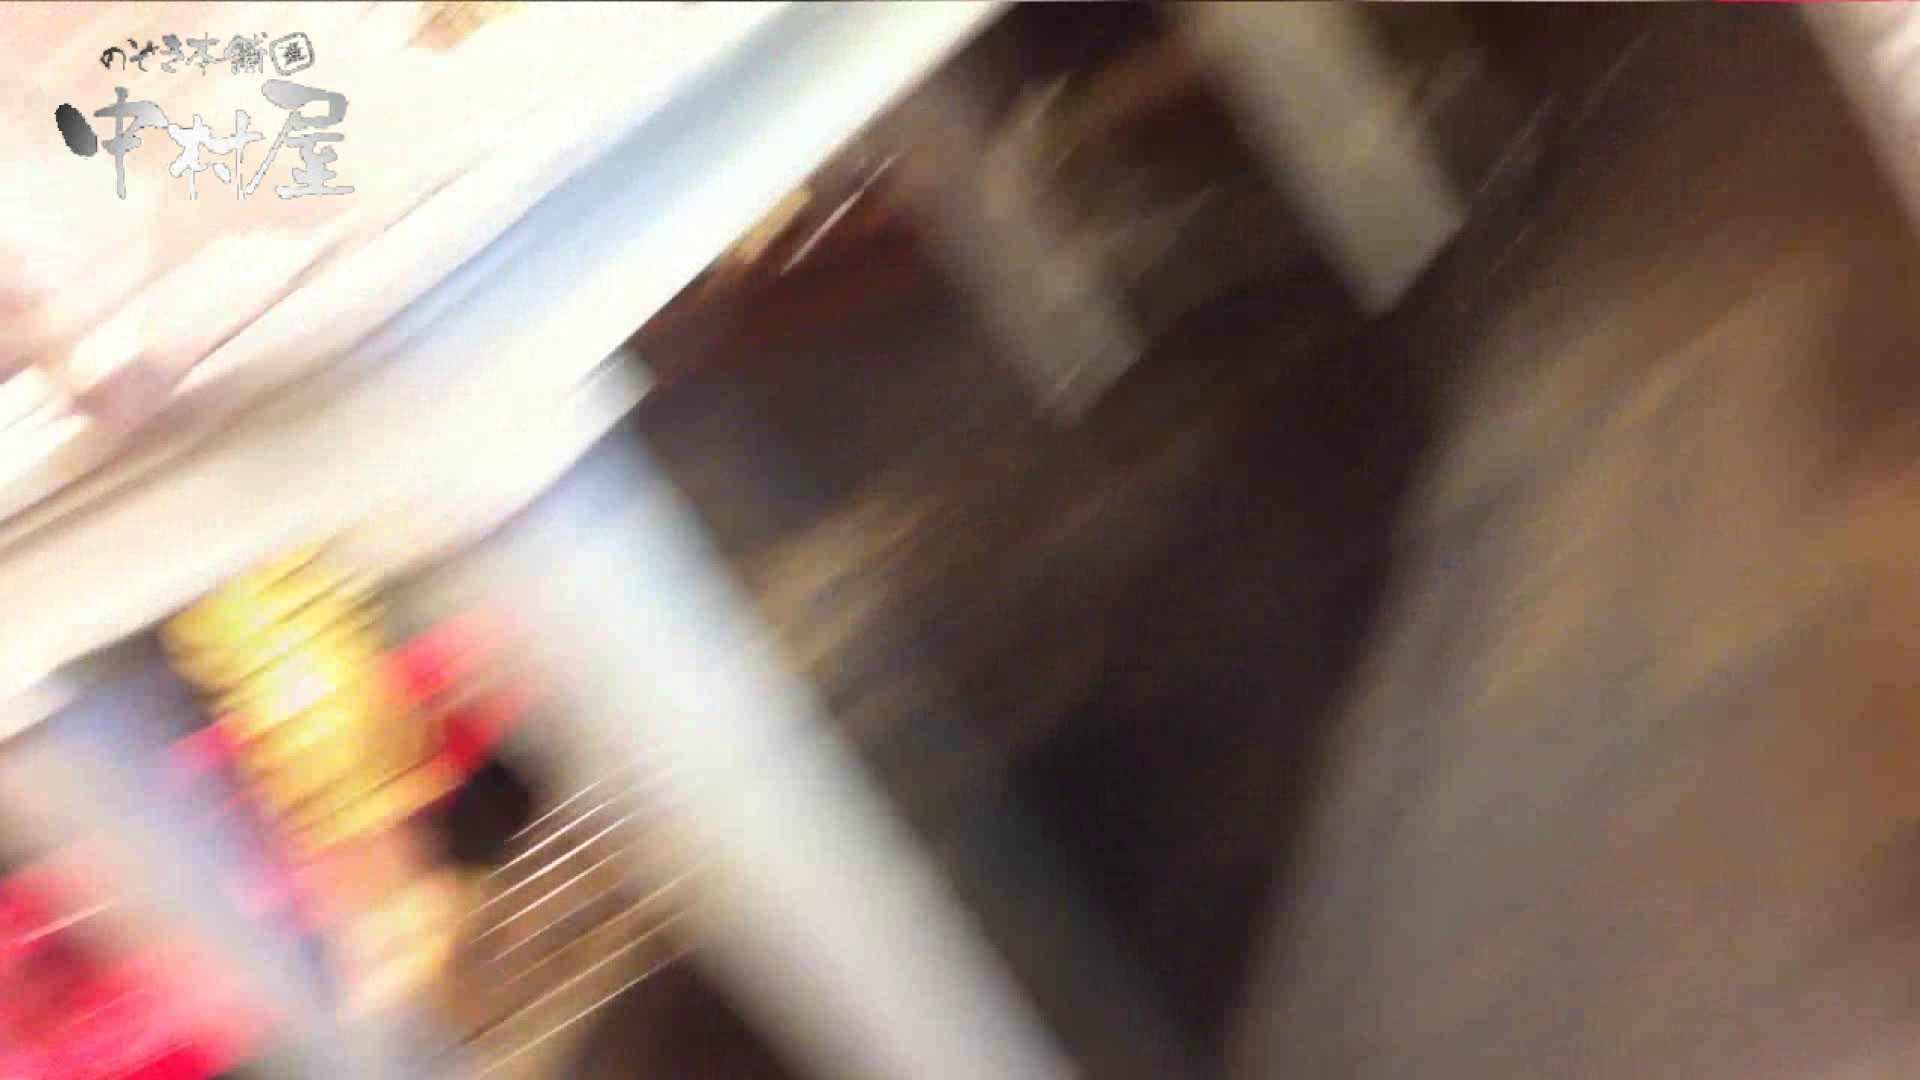 vol.65 美人アパレル胸チラ&パンチラ ムッチリ感がいい感じ花がらパンツさん チラ  106連発 76